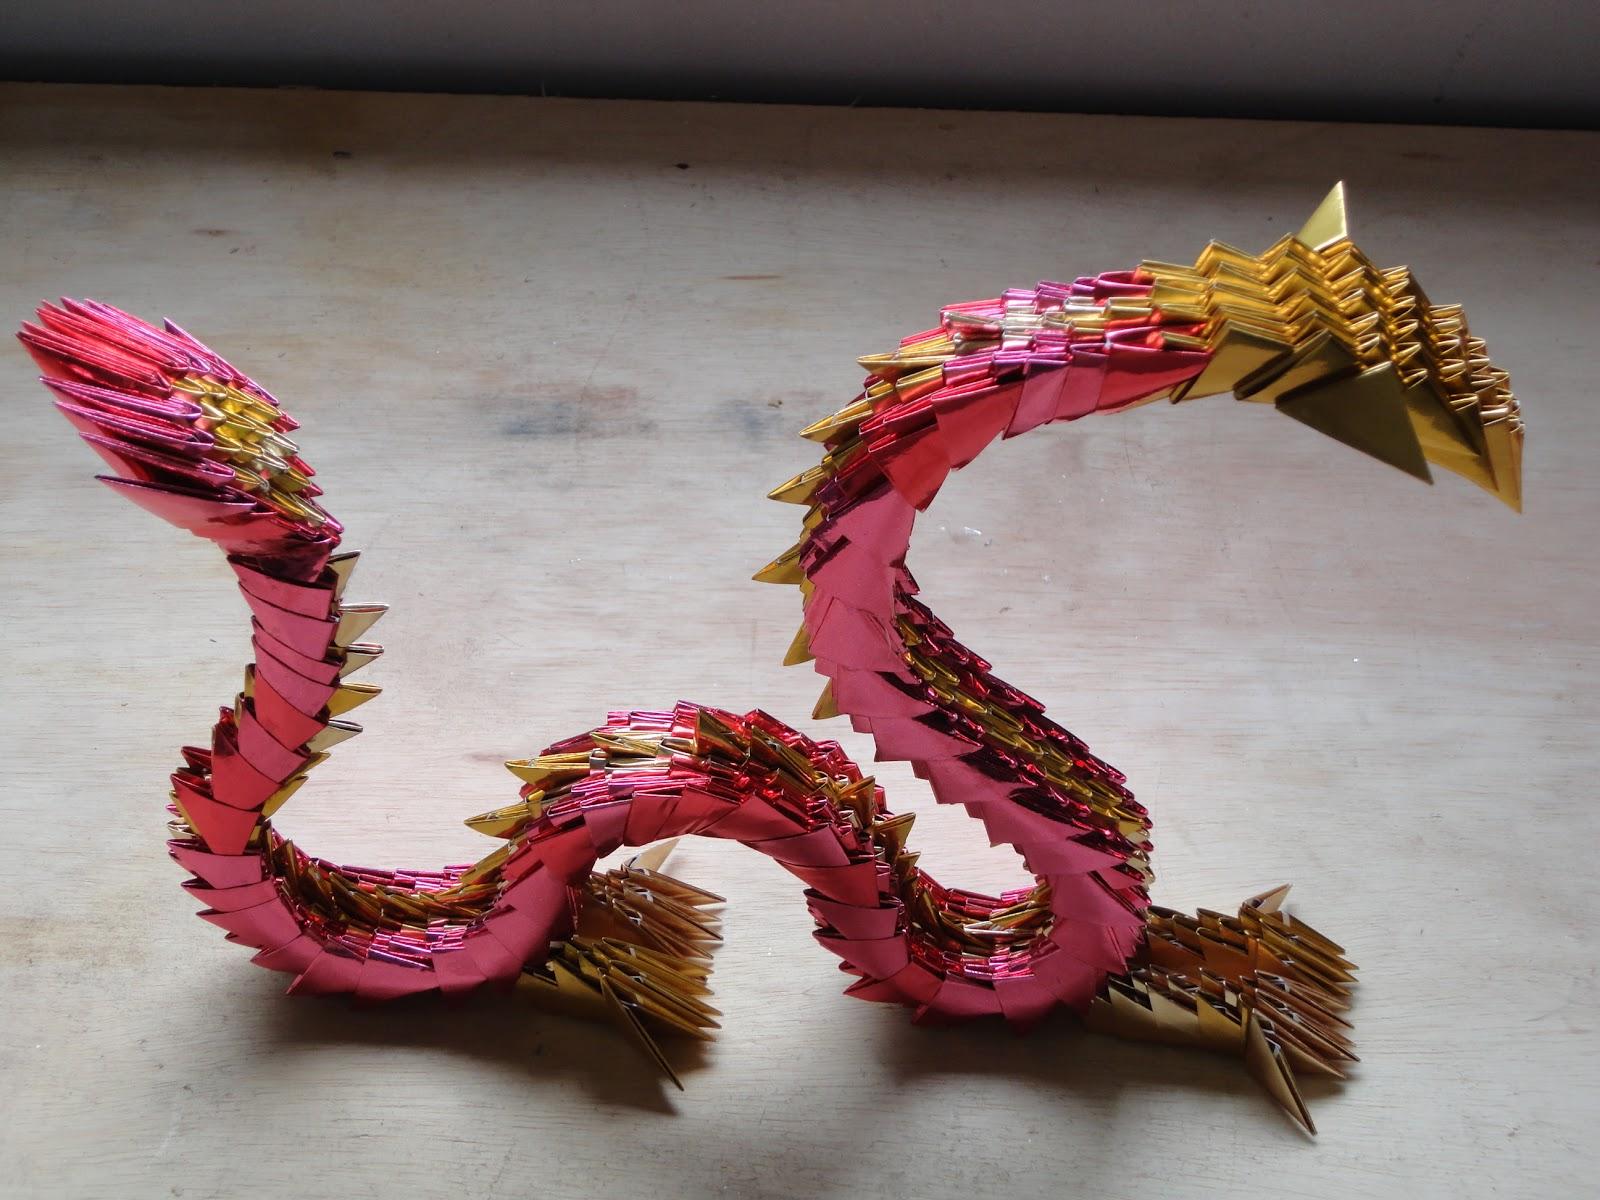 Papel Adesivo De Moveis ~ ILKA HARO Oriartes Artesanato japon u00eas Origami 2012 Ano do Drag u00e3o